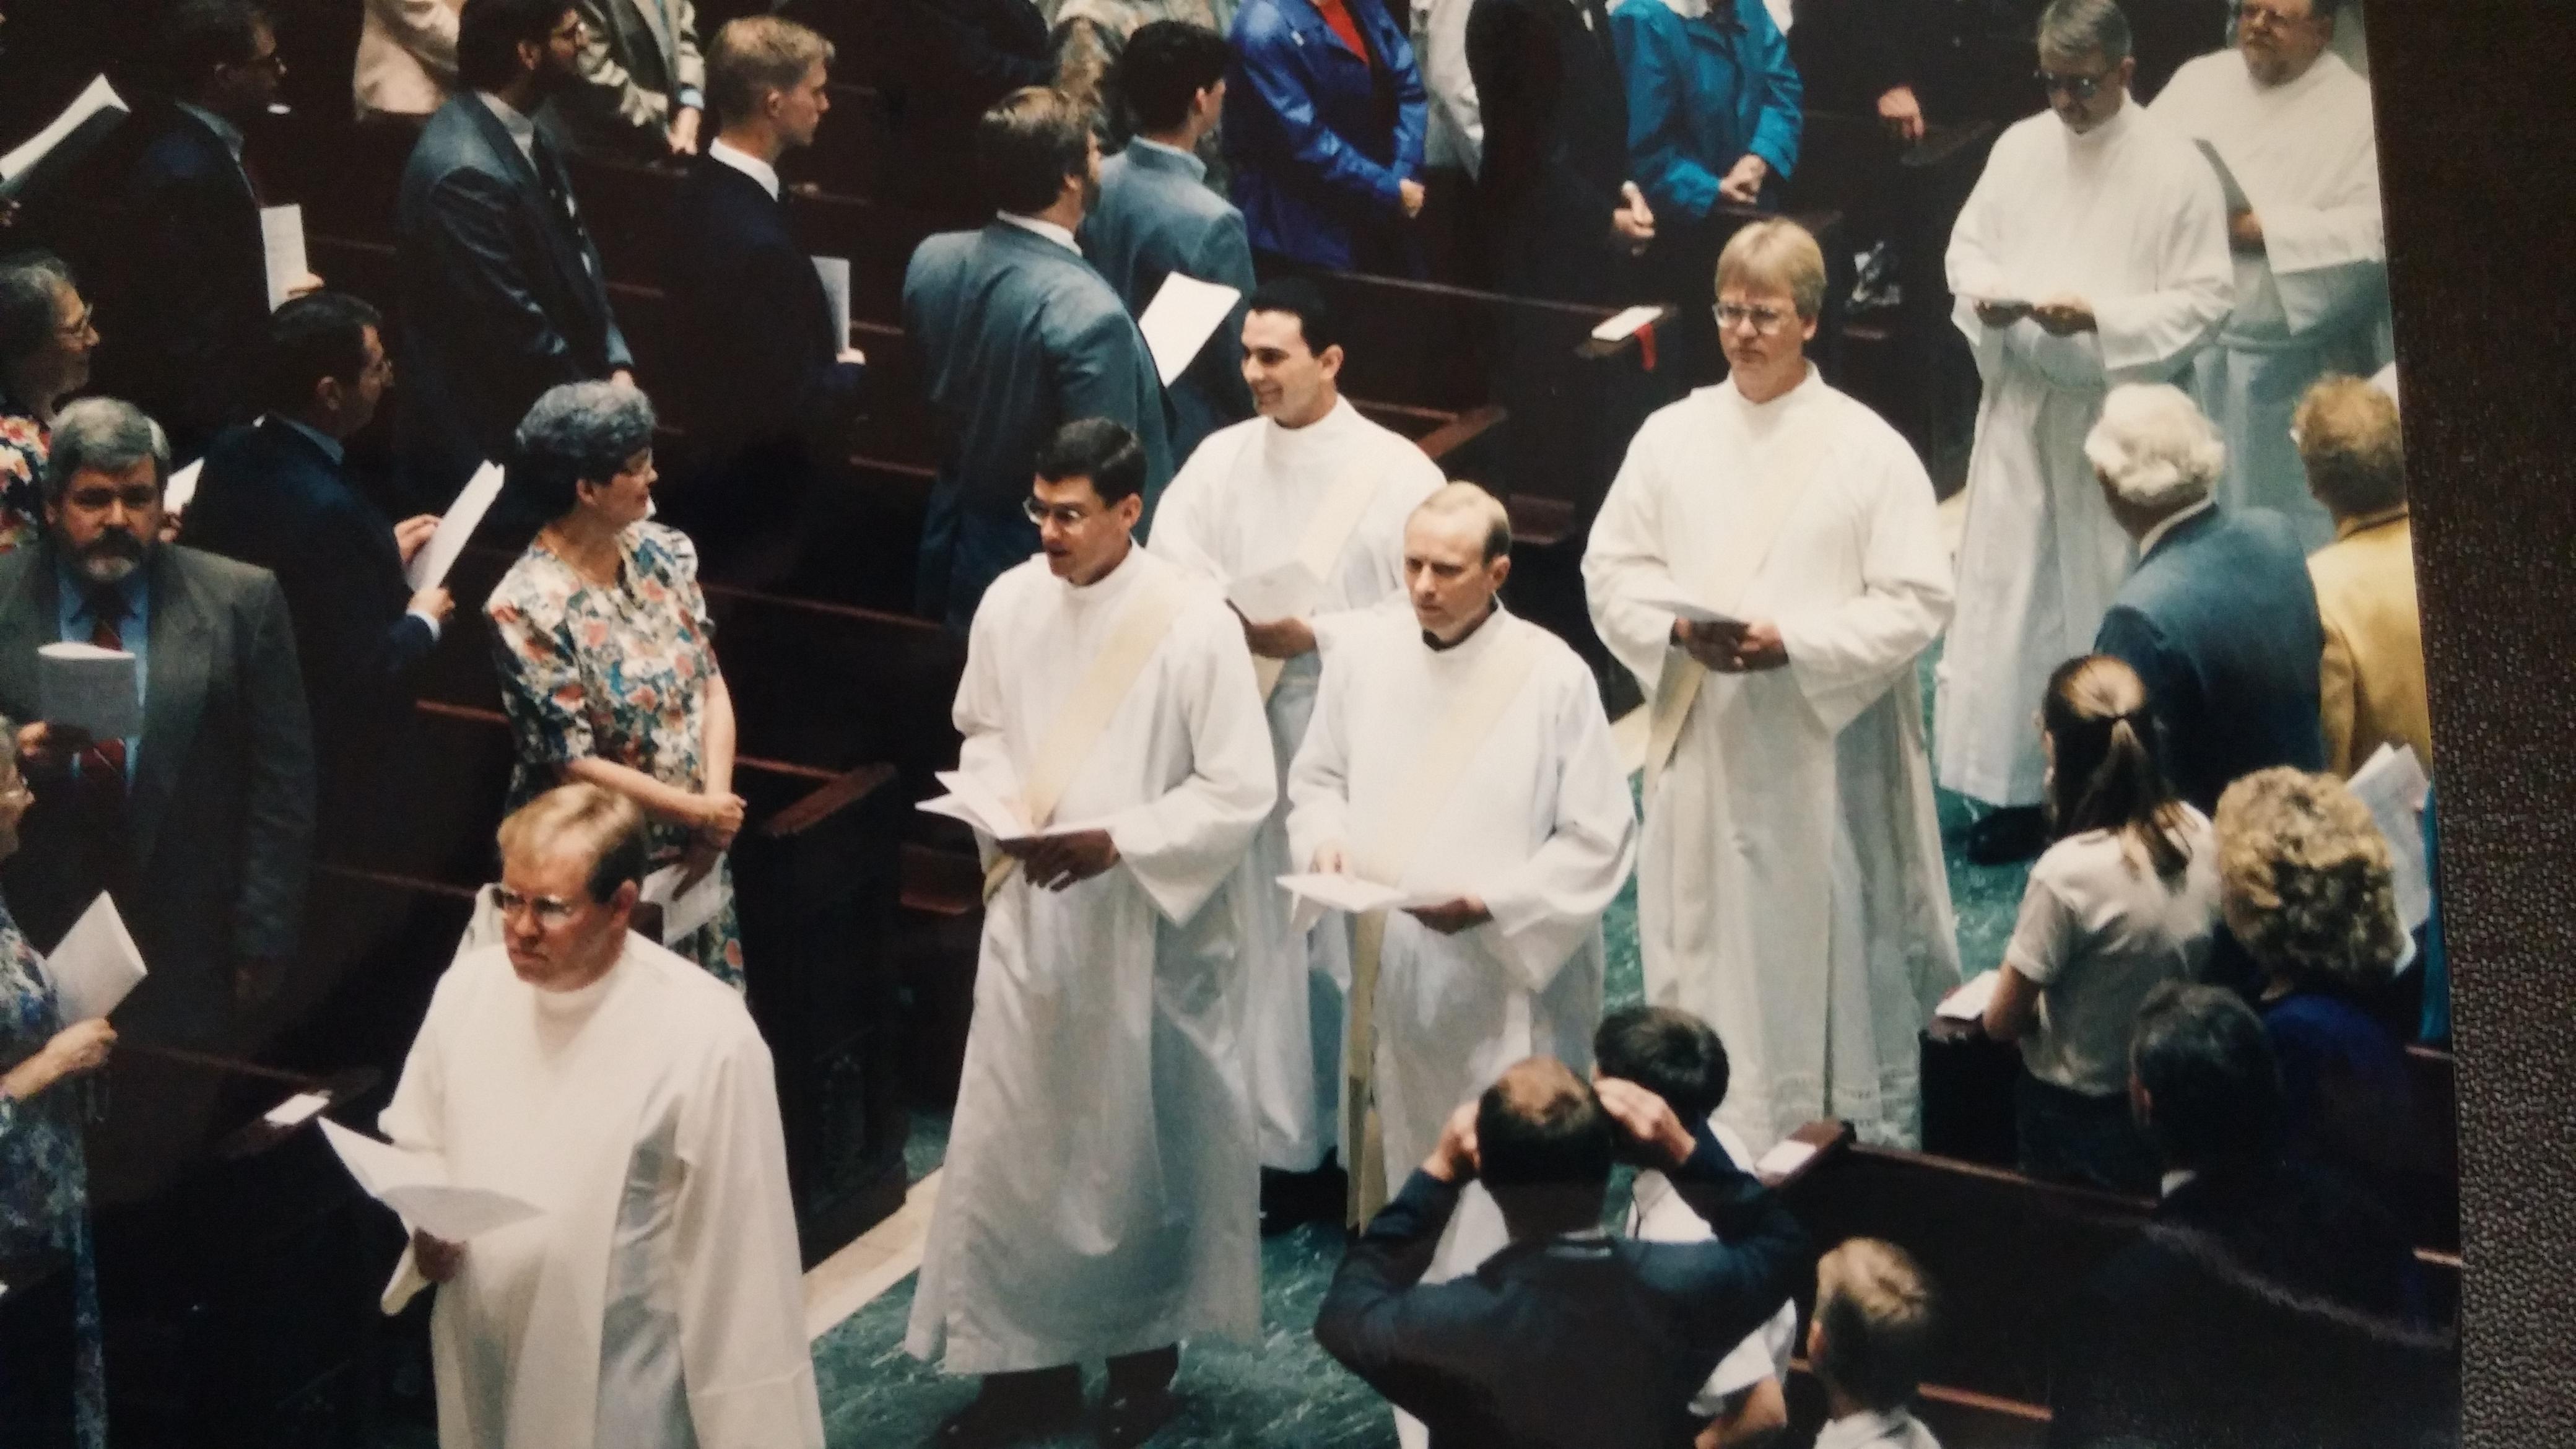 Deacons Piepmeyer, Sloneker, & Meyers prepare for Ordination